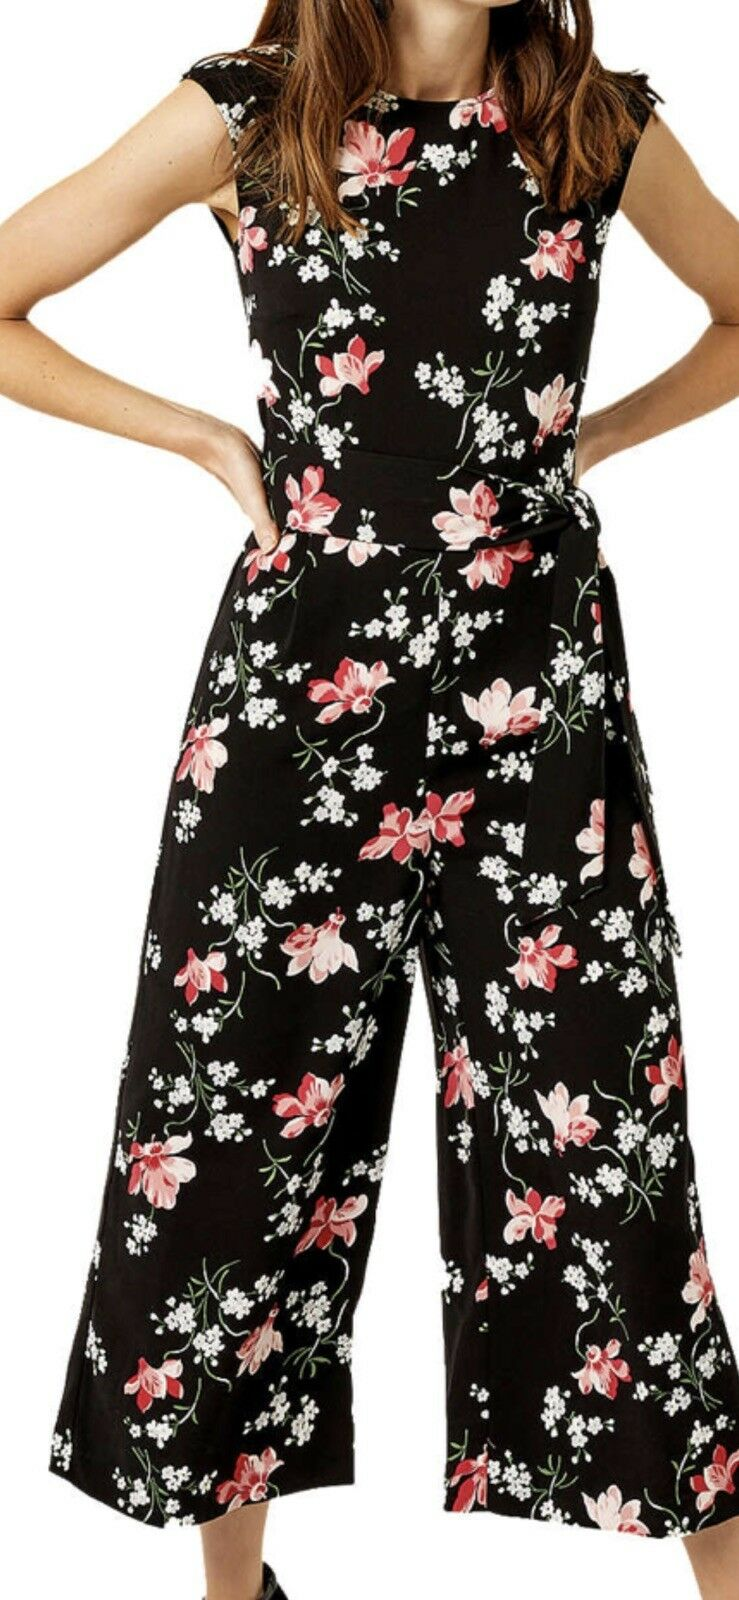 fec4b5adb2d Warehouse constantine floral print Jumpsuit Size 6 Black mix sleeveless 3 4  lgt